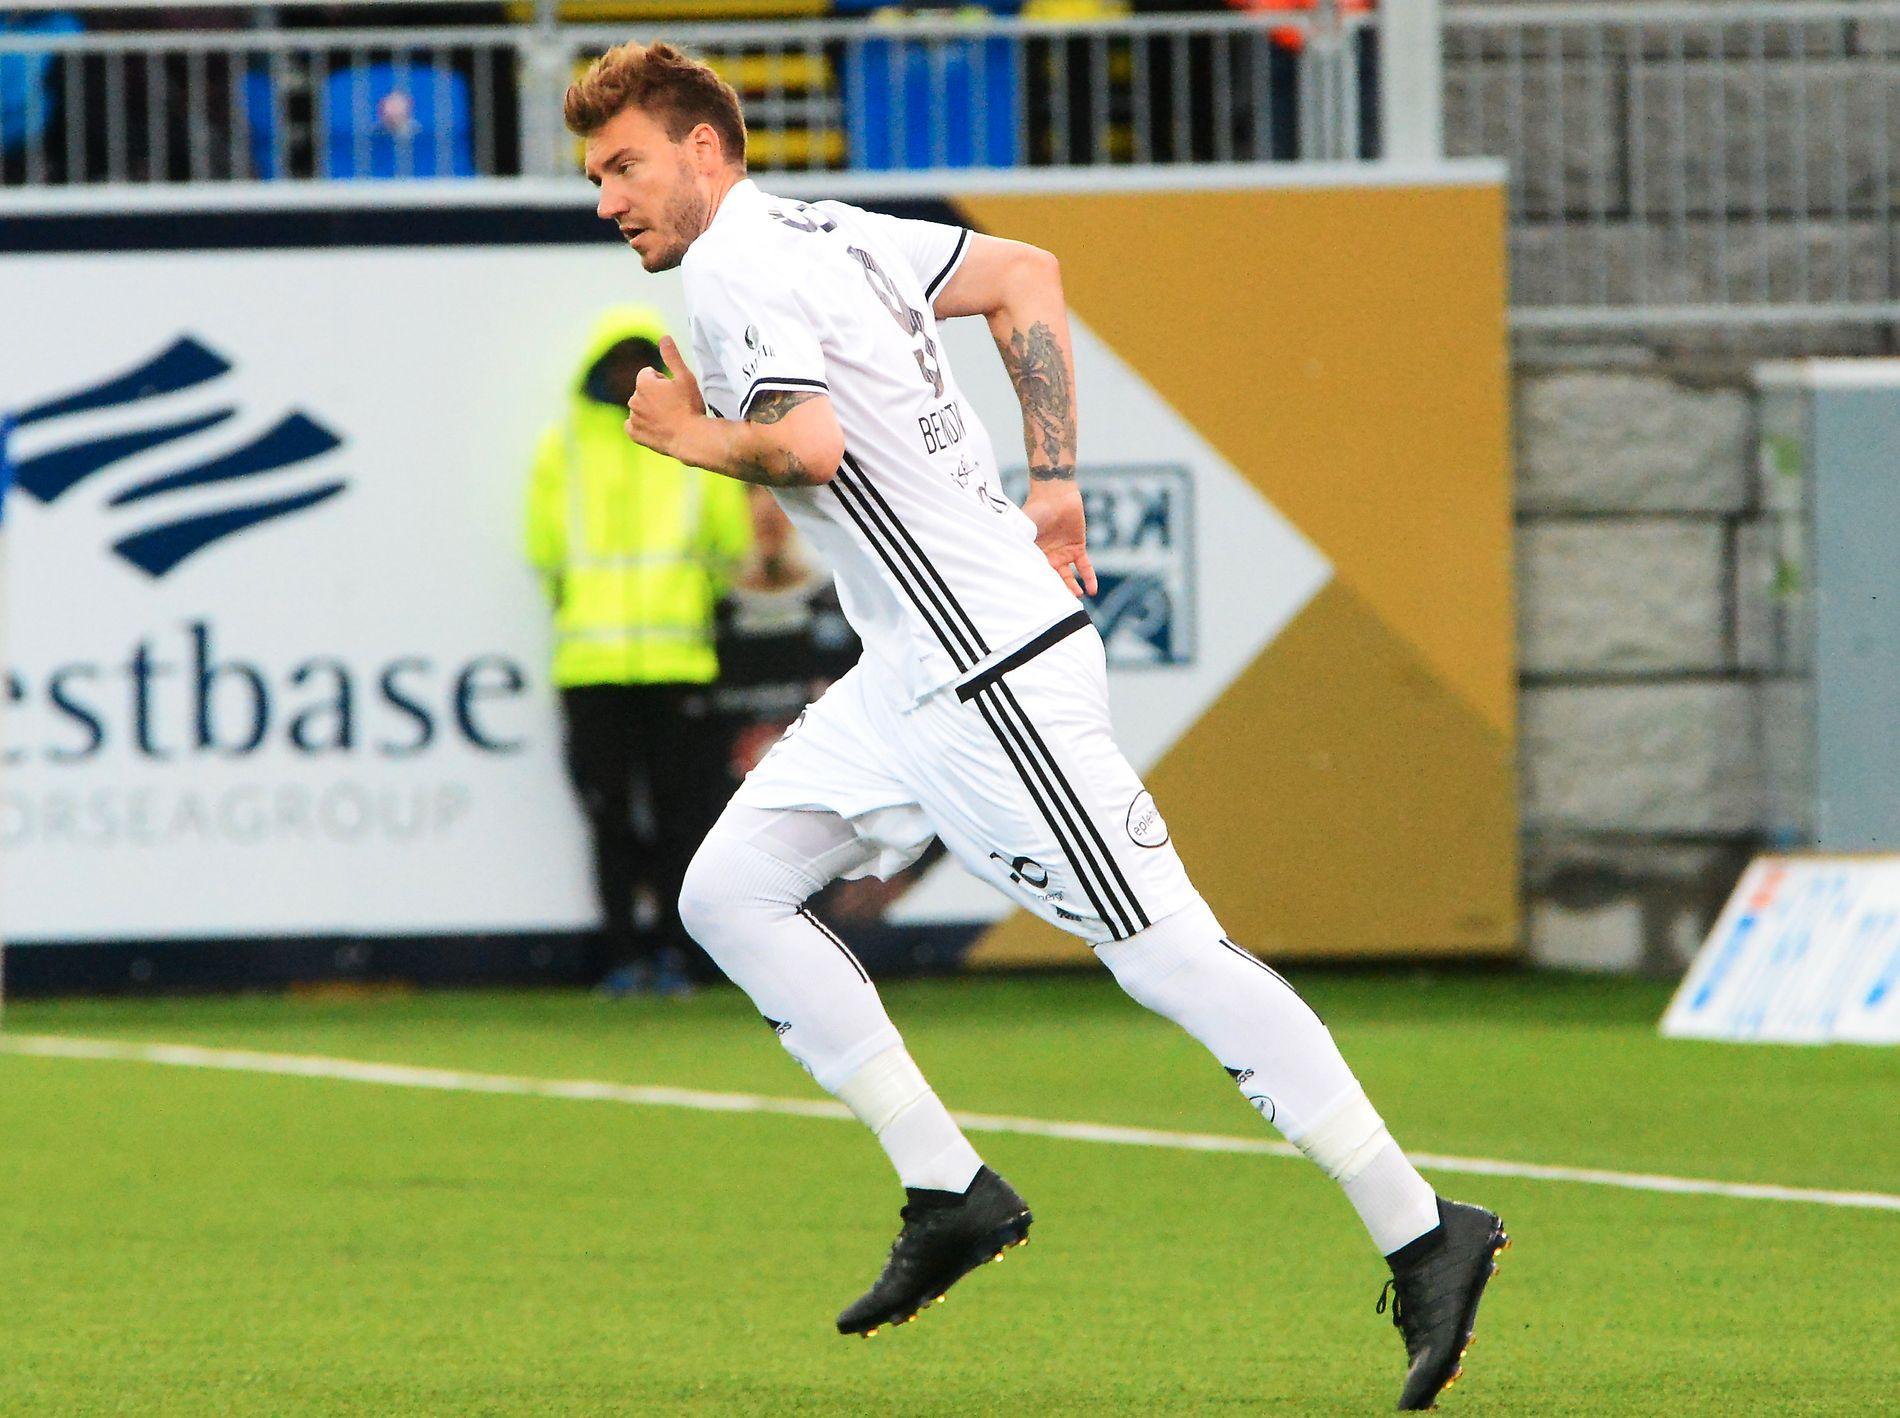 I HELSVART: Nicklas Bendtner i helsvarte Adidas-sko mot Kristiansund sist mandag.